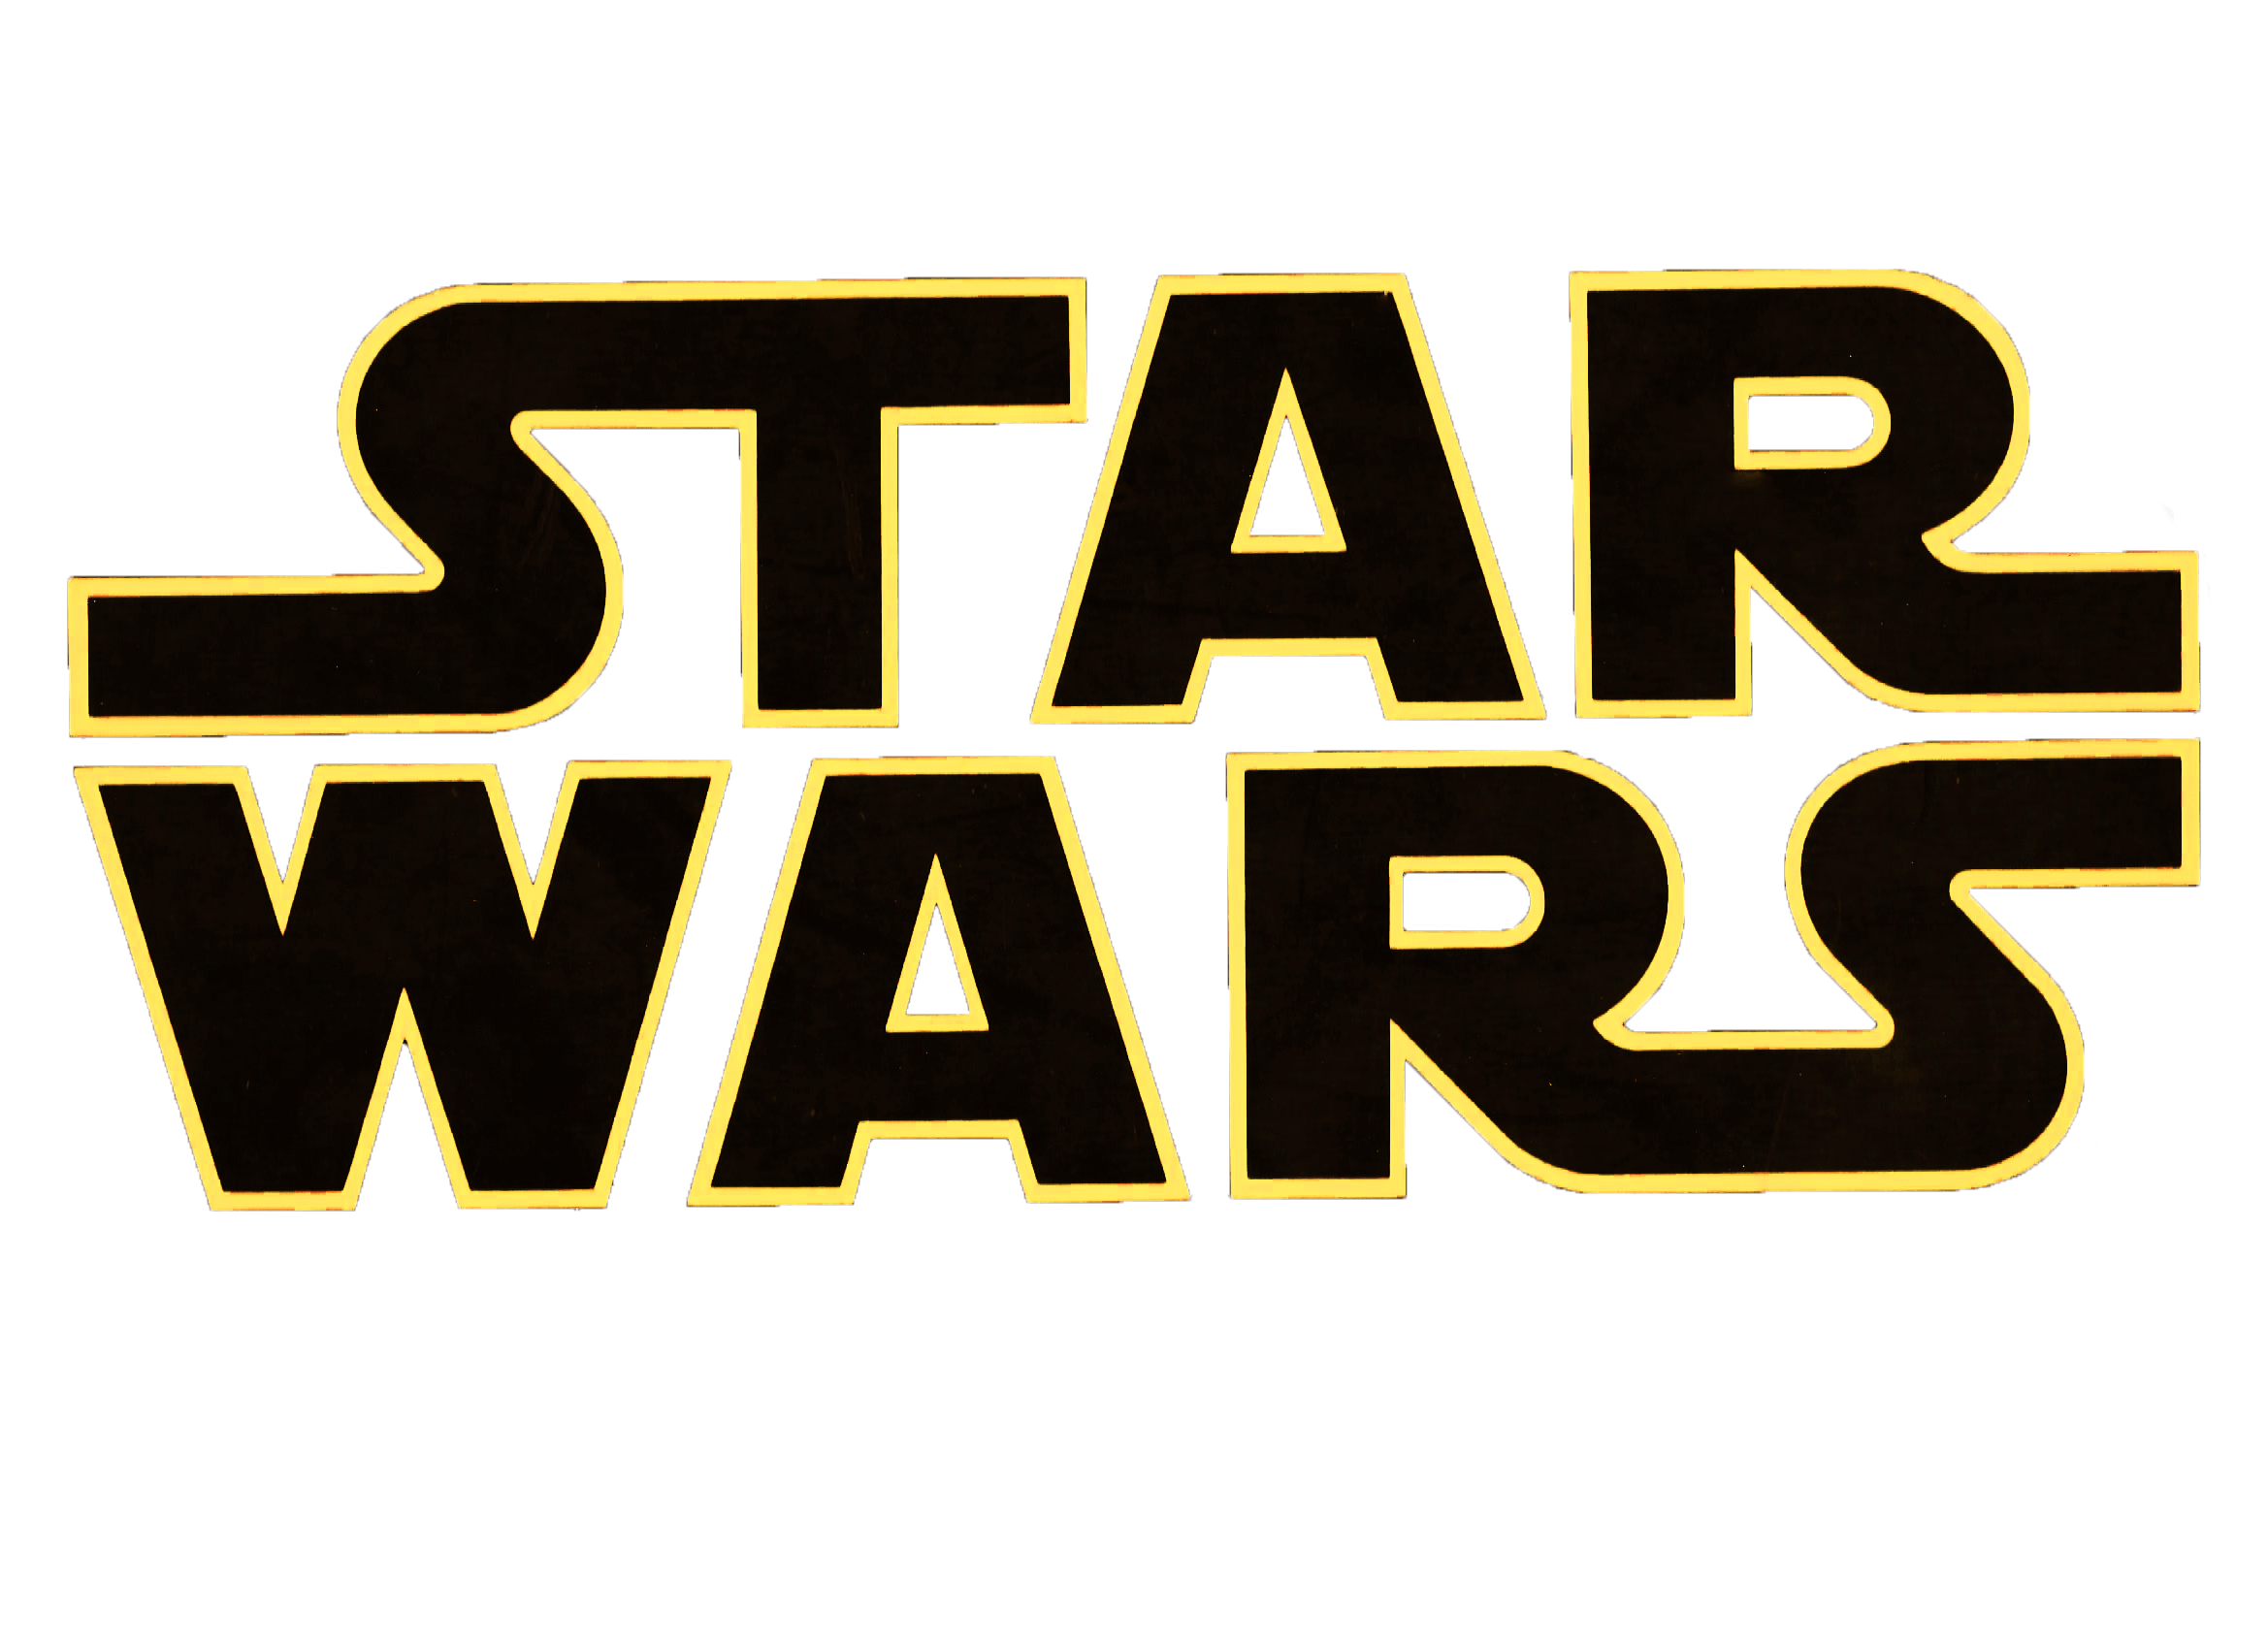 [39+] Star Wars Blank Background on WallpaperSafari